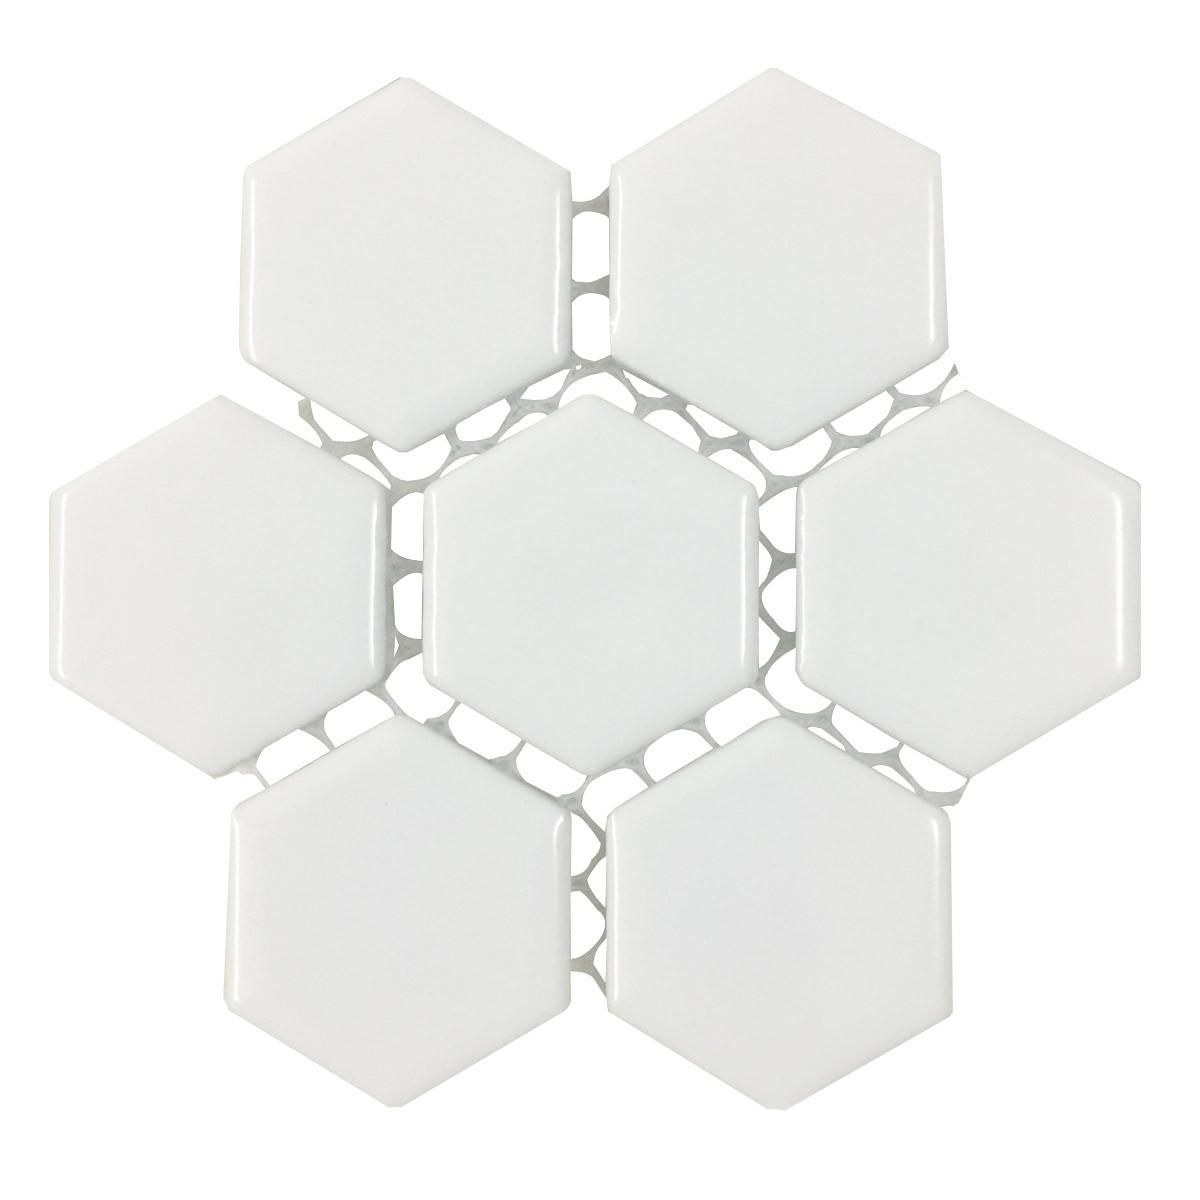 Porcelain Mosaic Hexagon Glossy White Floor and Wall Tile 19.3 SQ FT Floor Tiles Mosaic Wall Tiles Mosaic Wall Tiles Ceramic